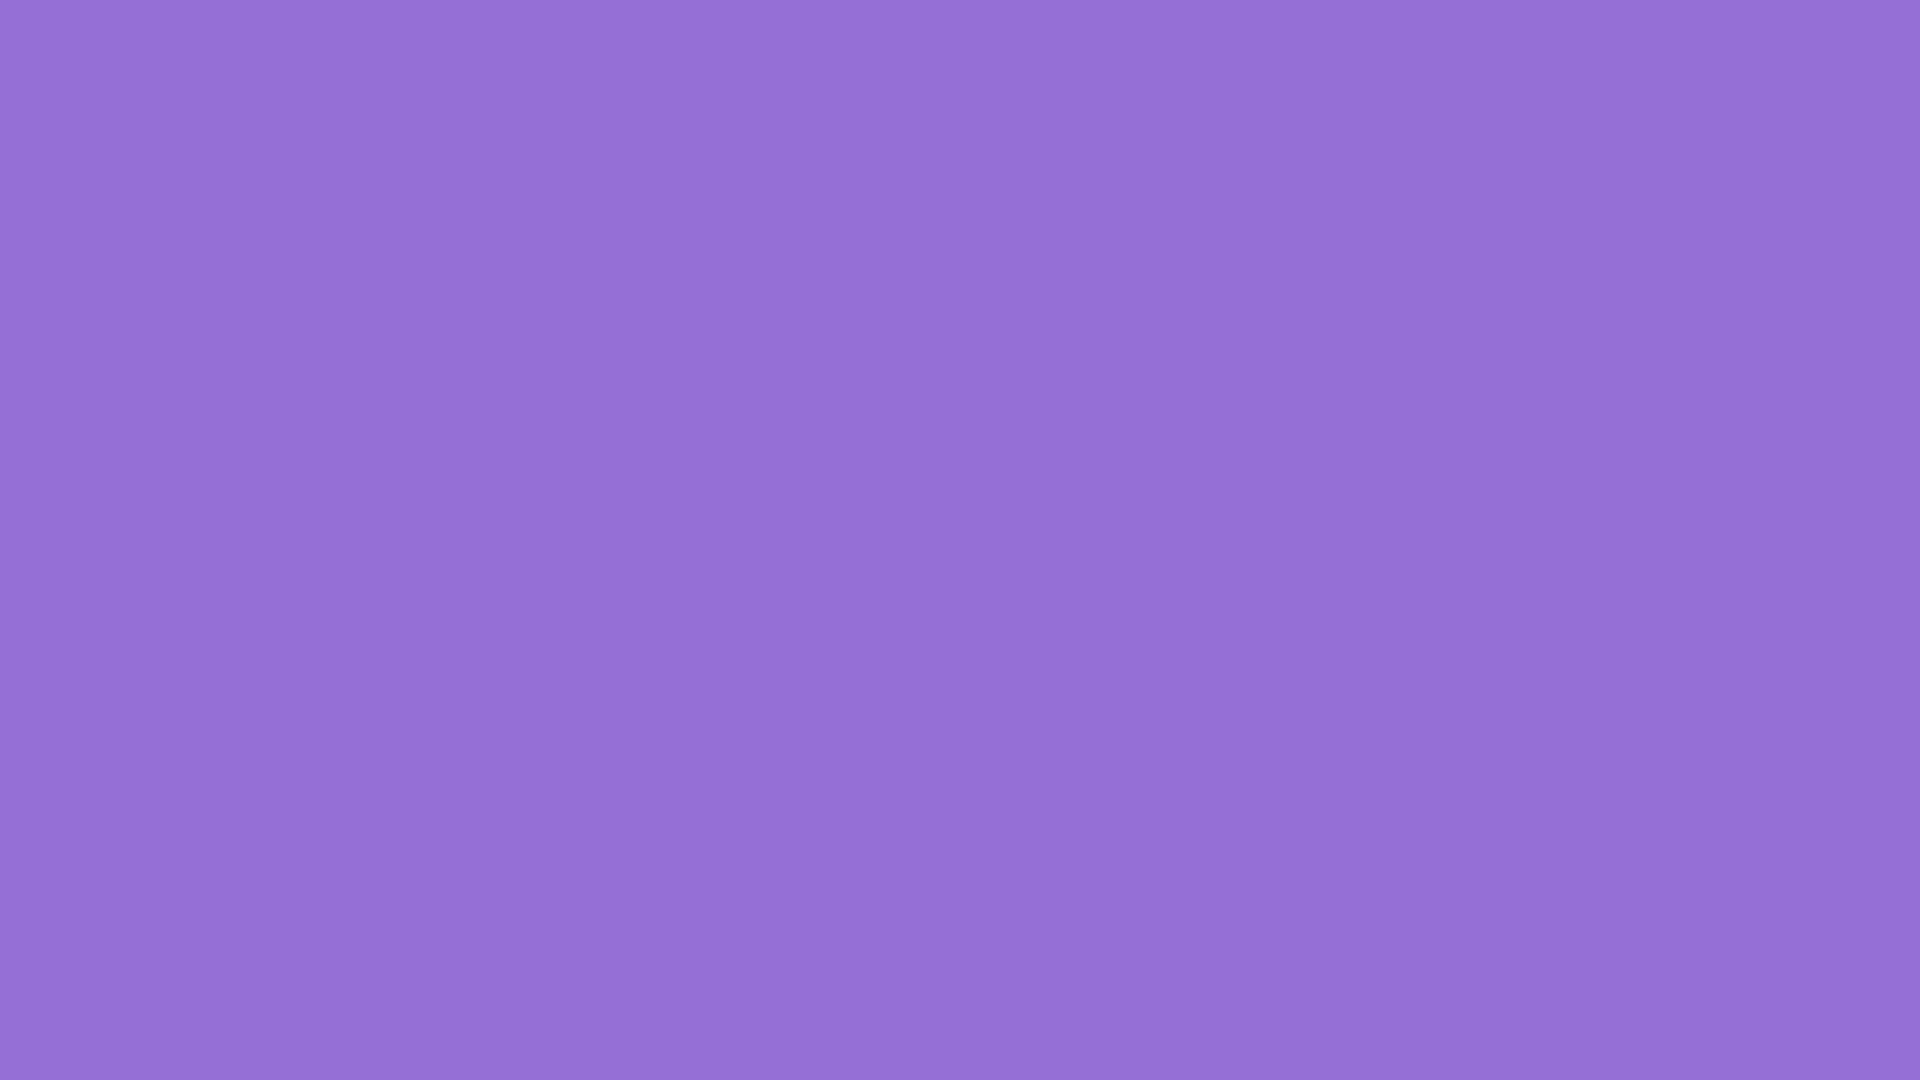 Dark Pastel Purple Solid Color Background